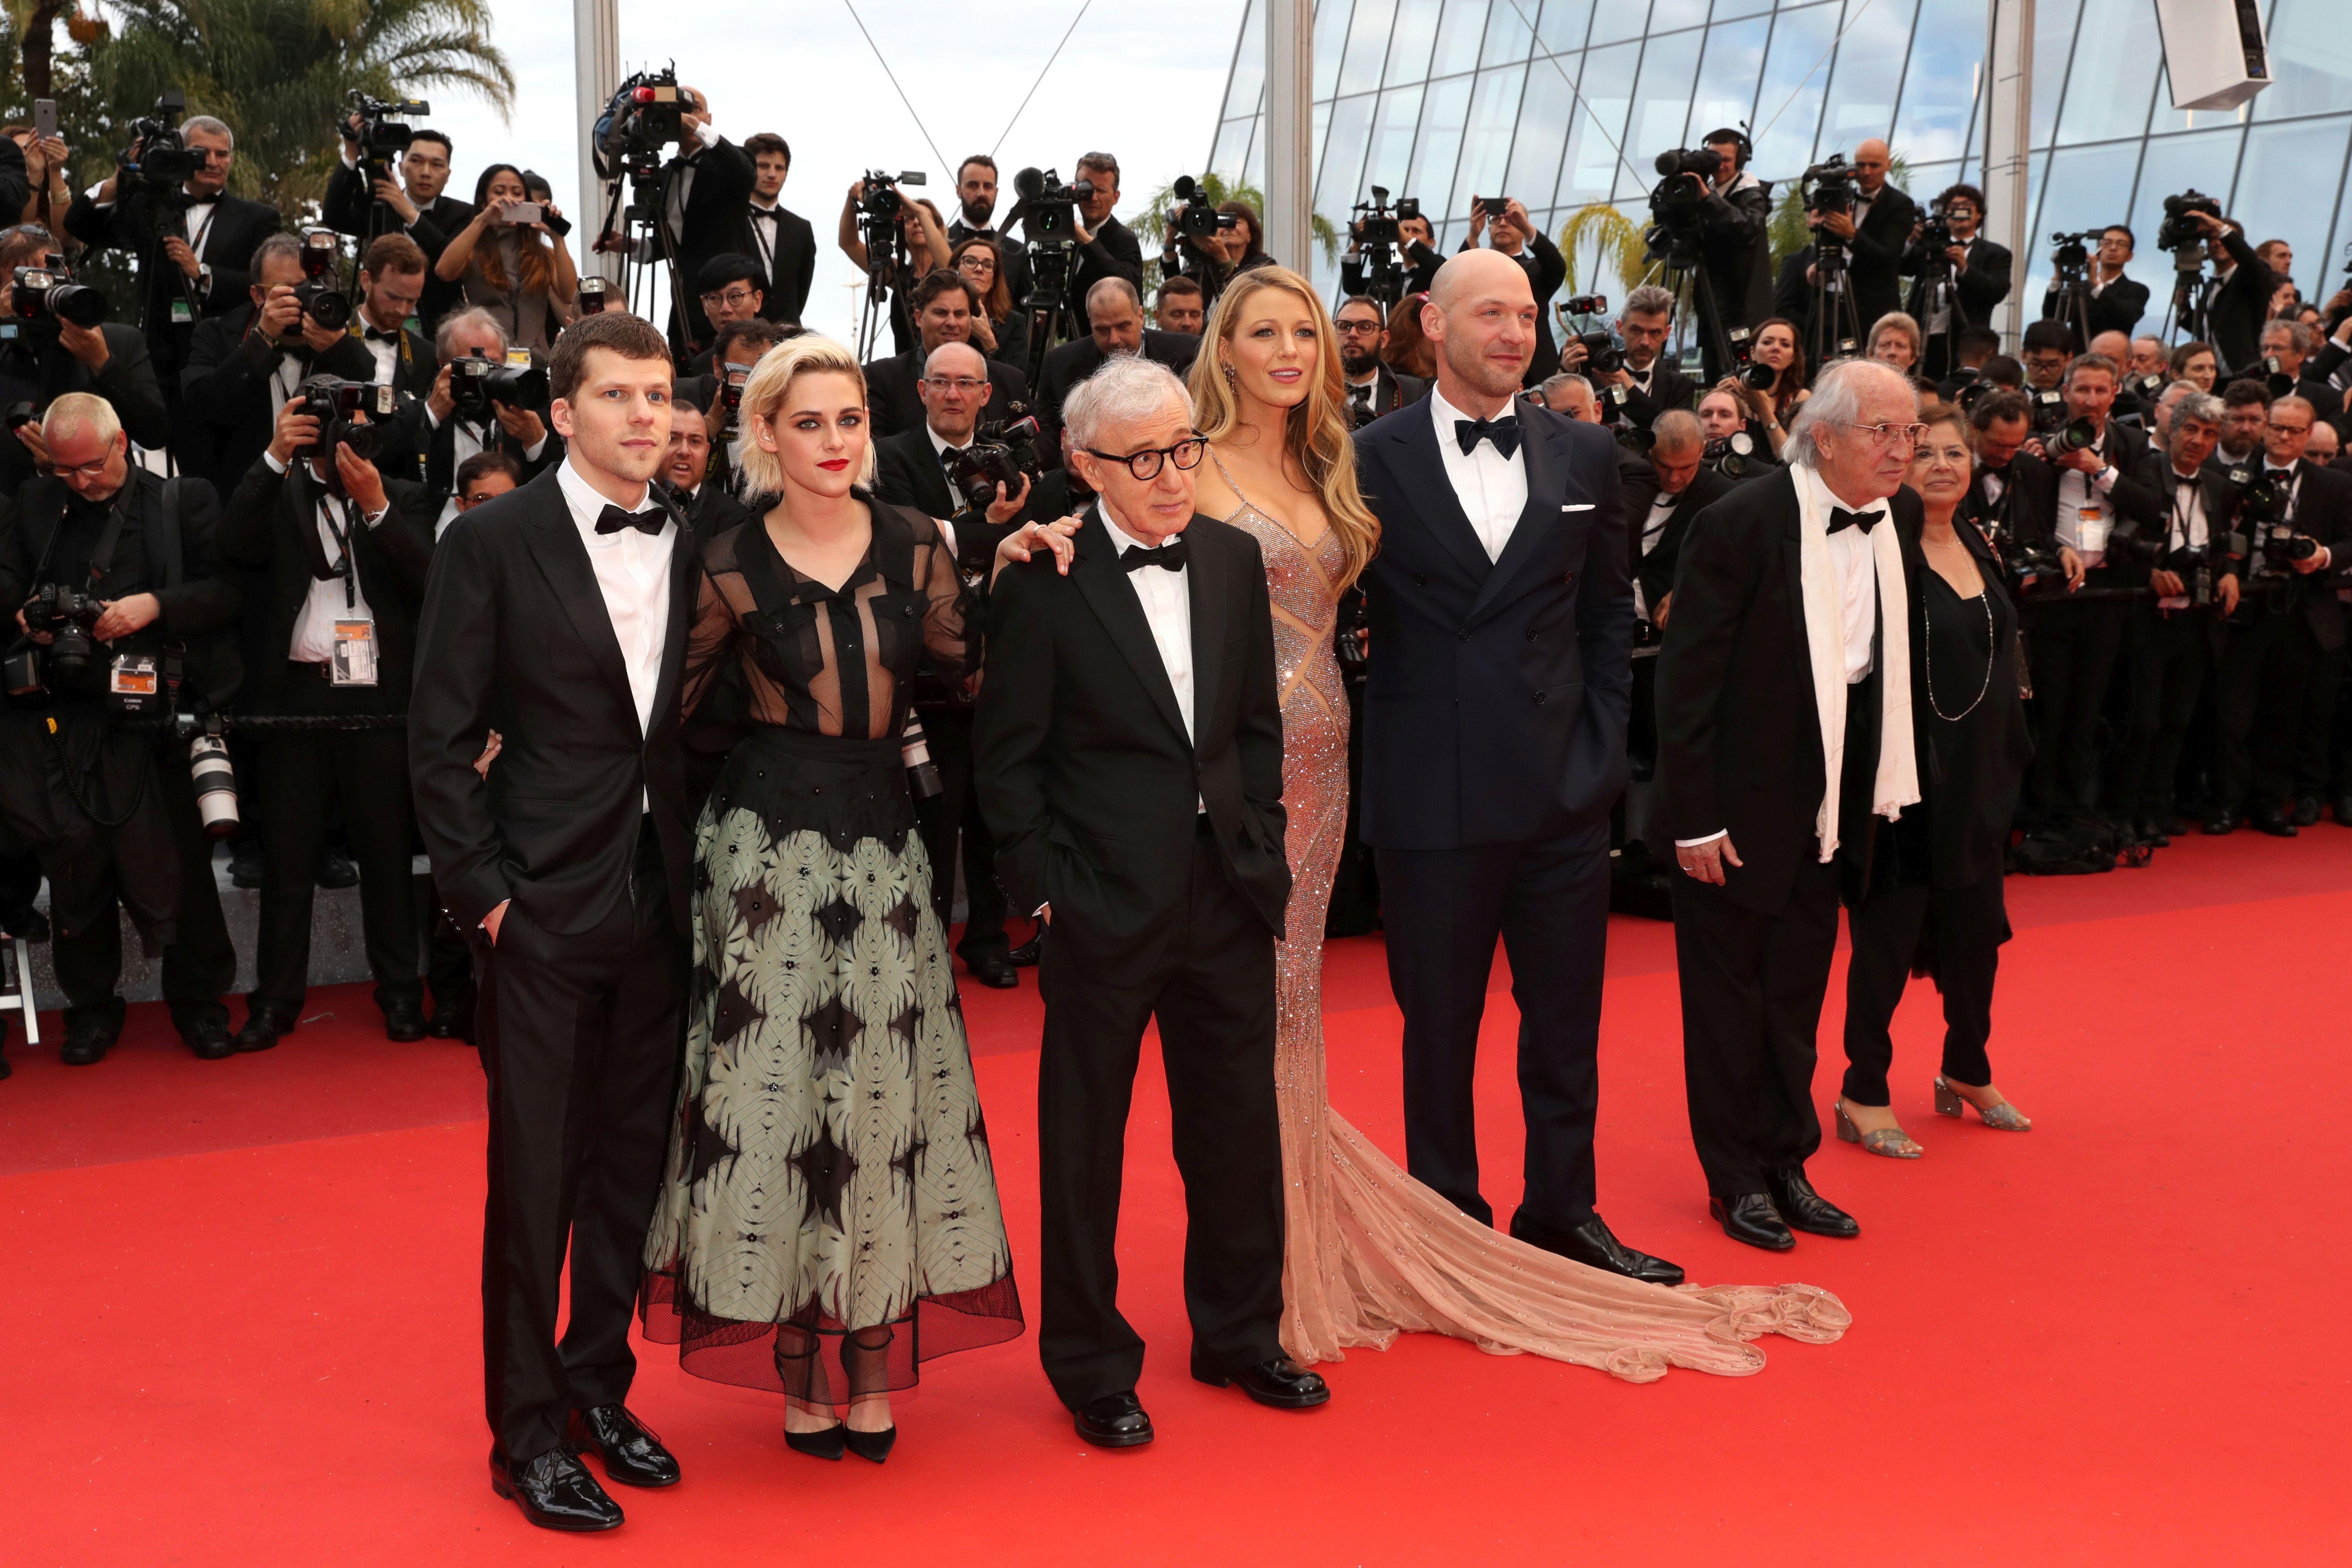 FOTO: CANNES 1. DAN: Film vitalnog 80-godišnjaka Woodya Allena otvorio festival